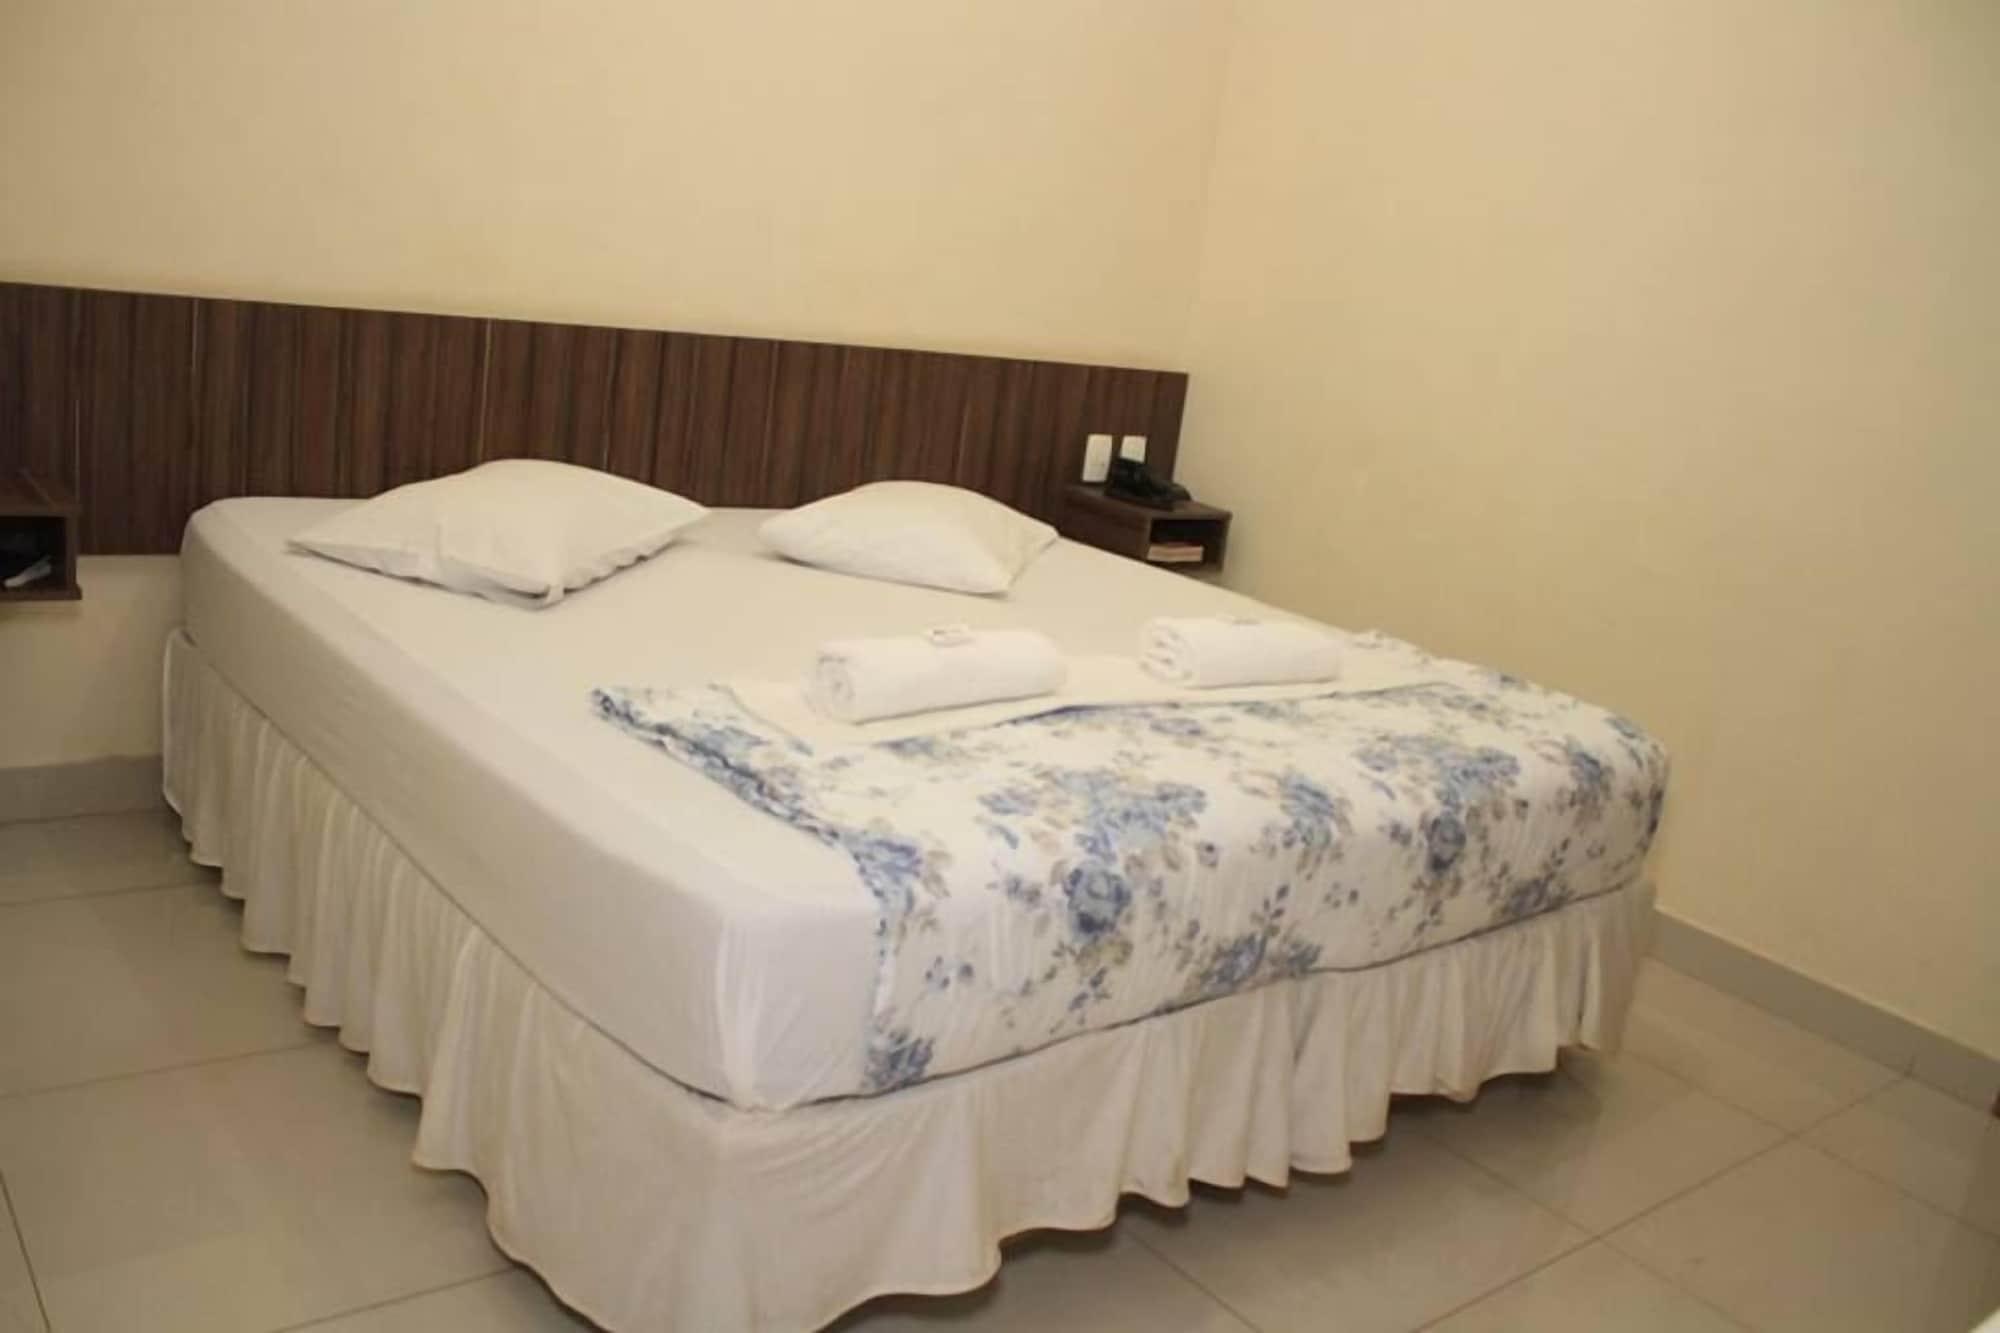 Astro Palace Hotel, Uberlândia